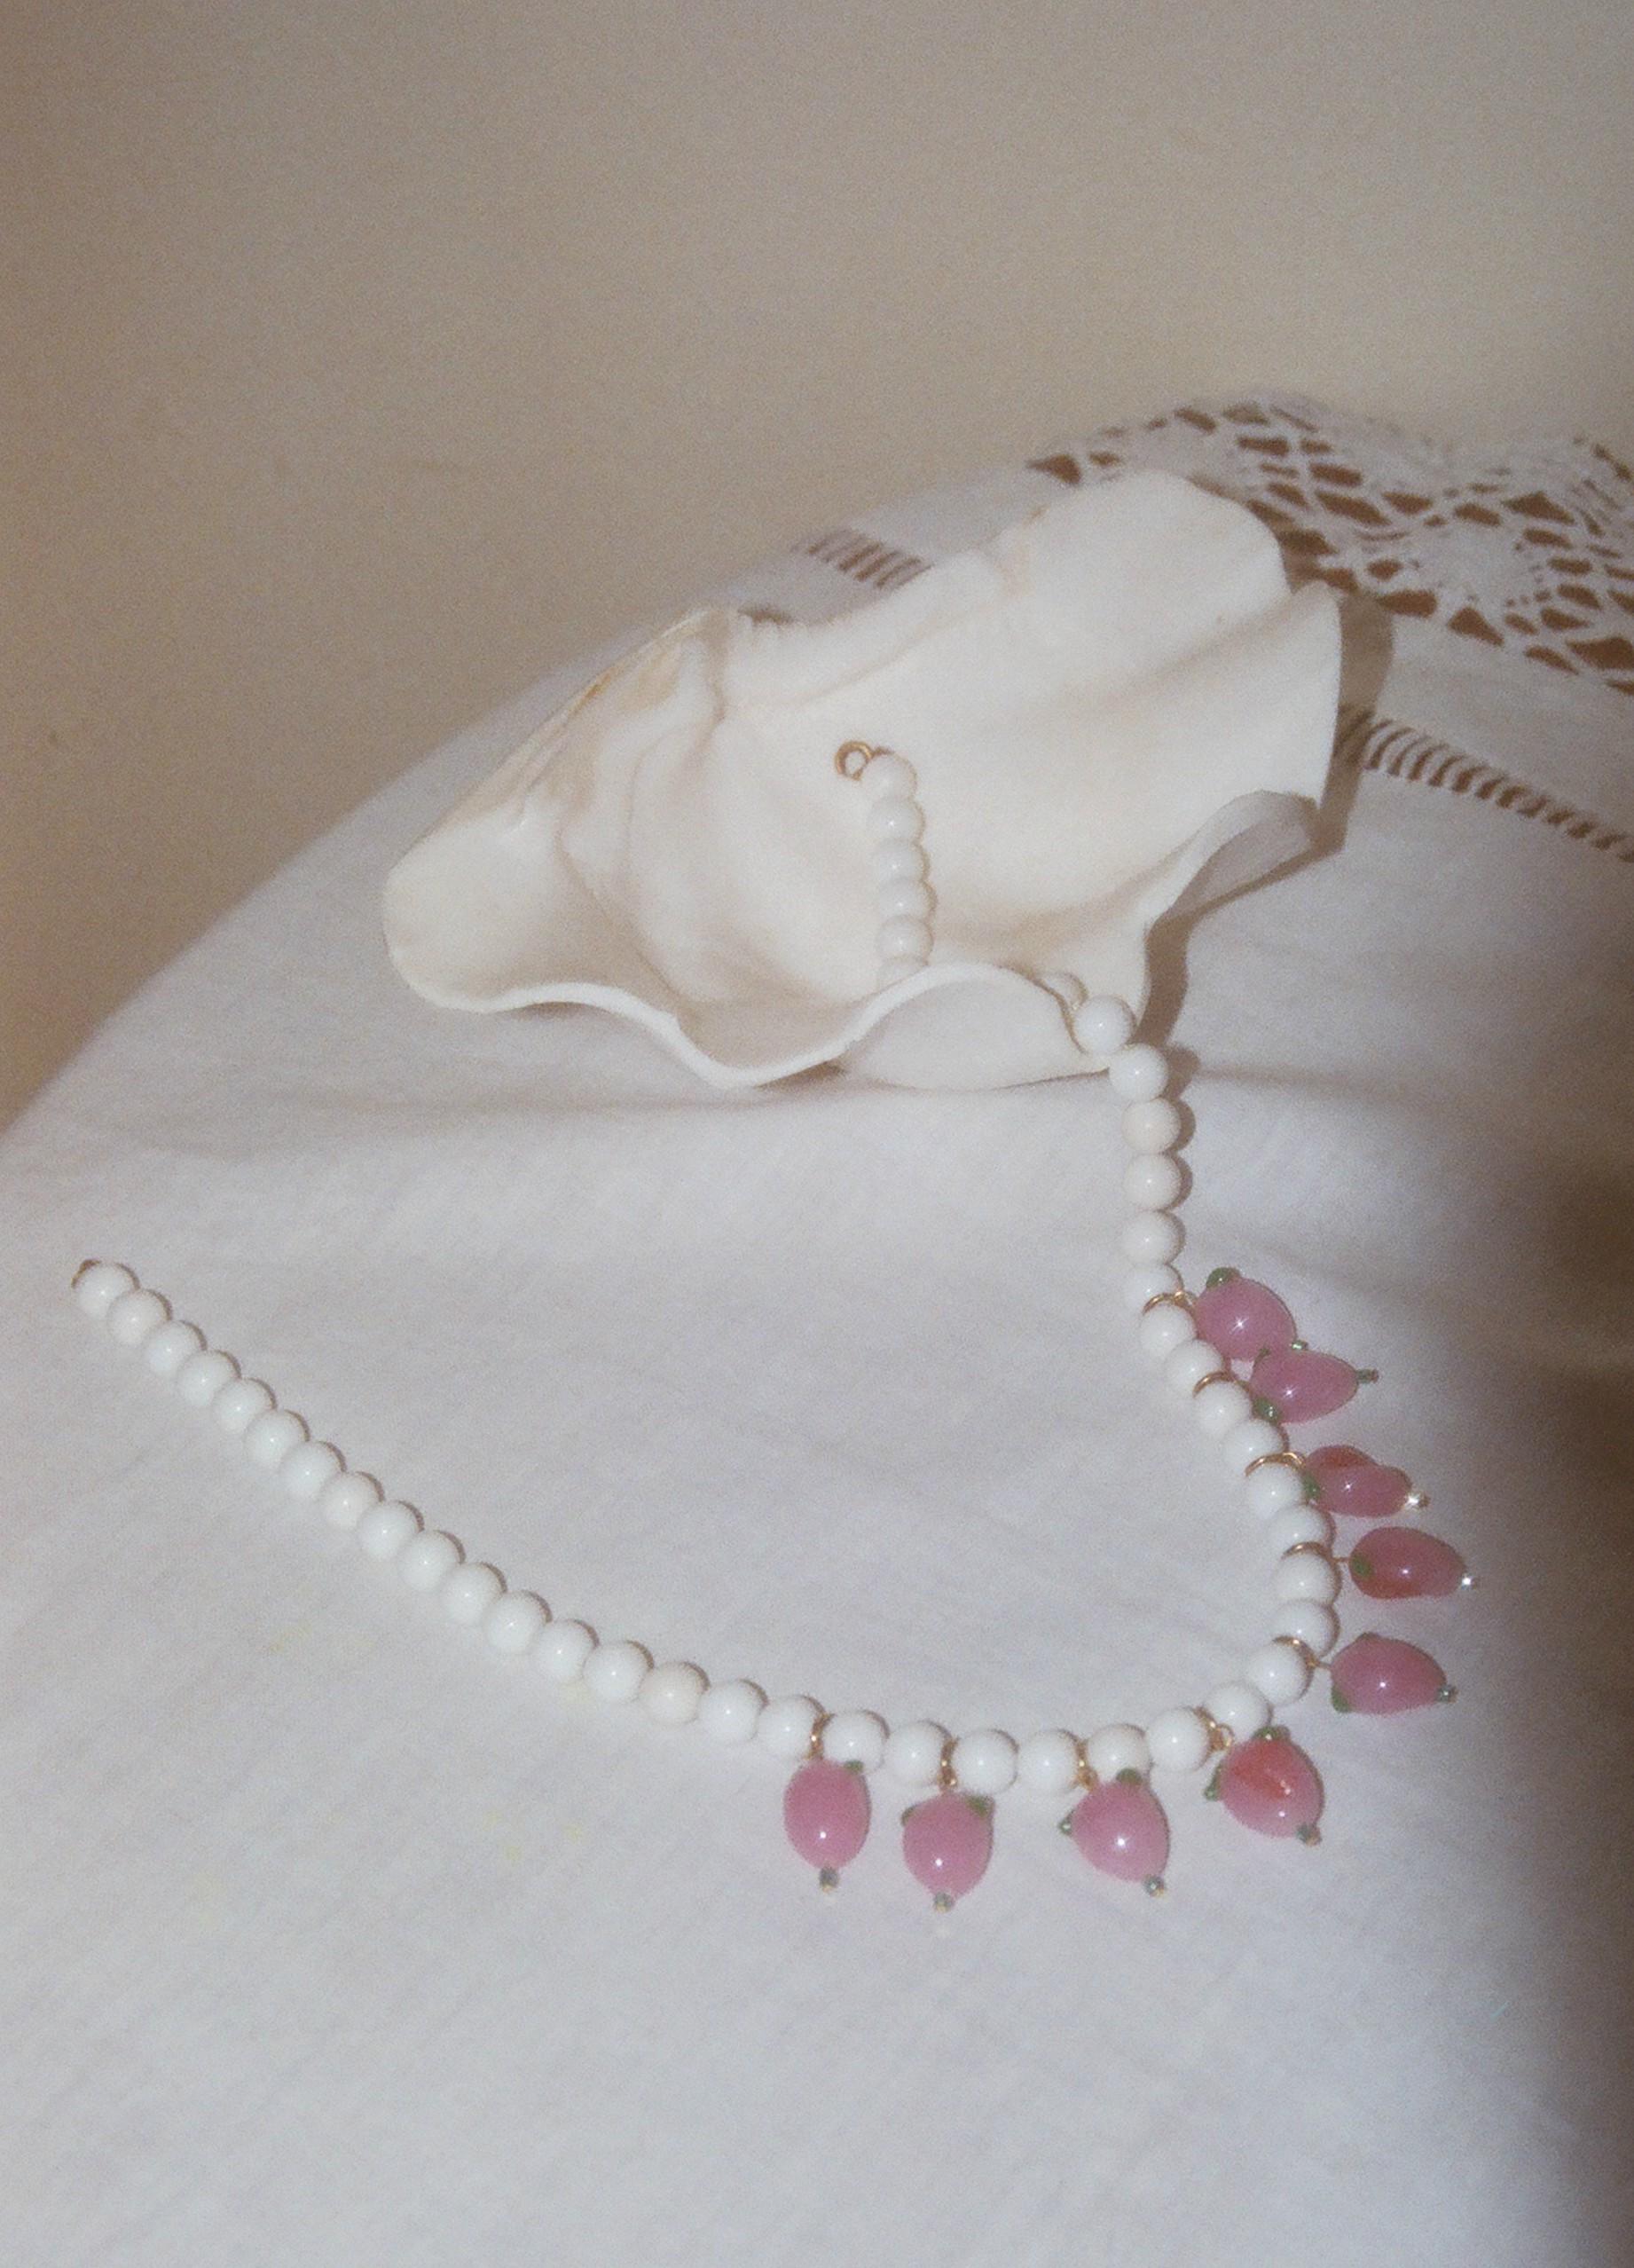 berry glass necklace 9.jpg